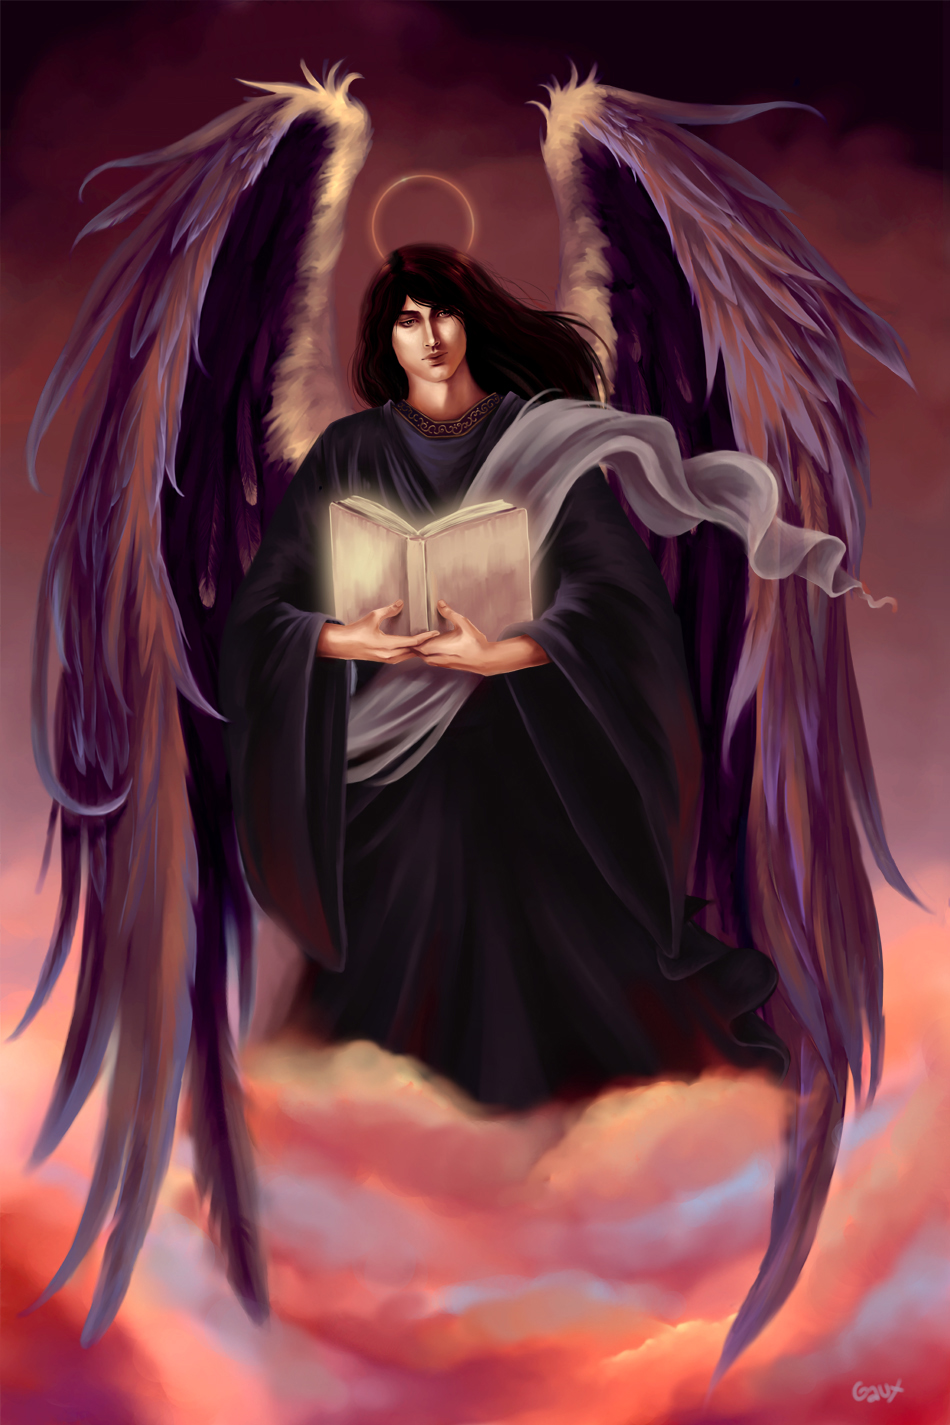 Archangel Azrael by gaux-gaux on DeviantArt